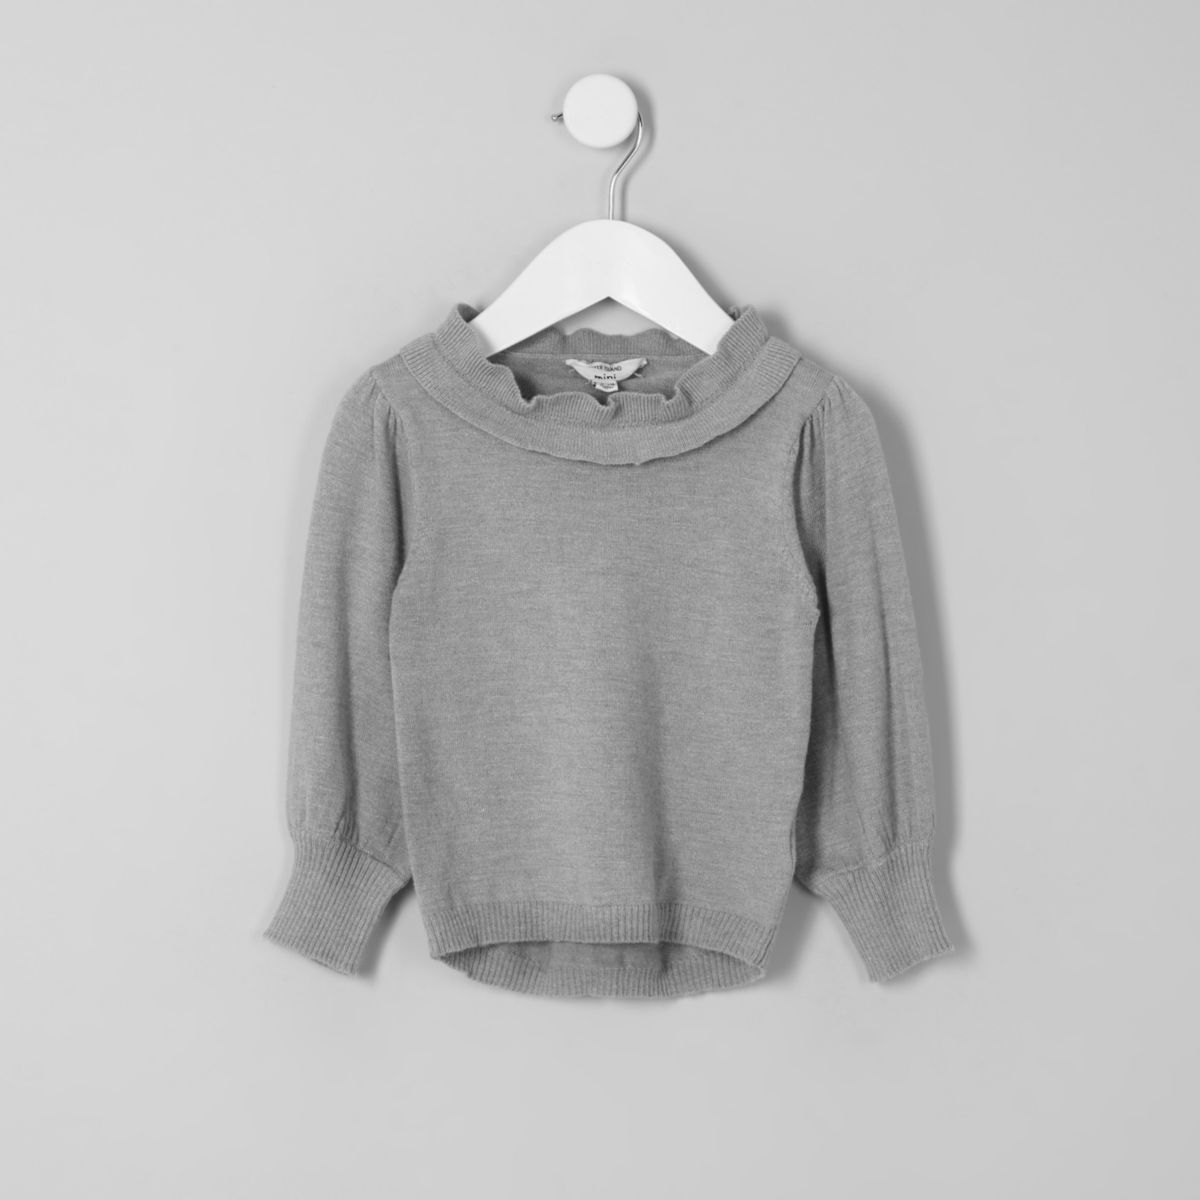 Mini girls grey frill layered neck jumper